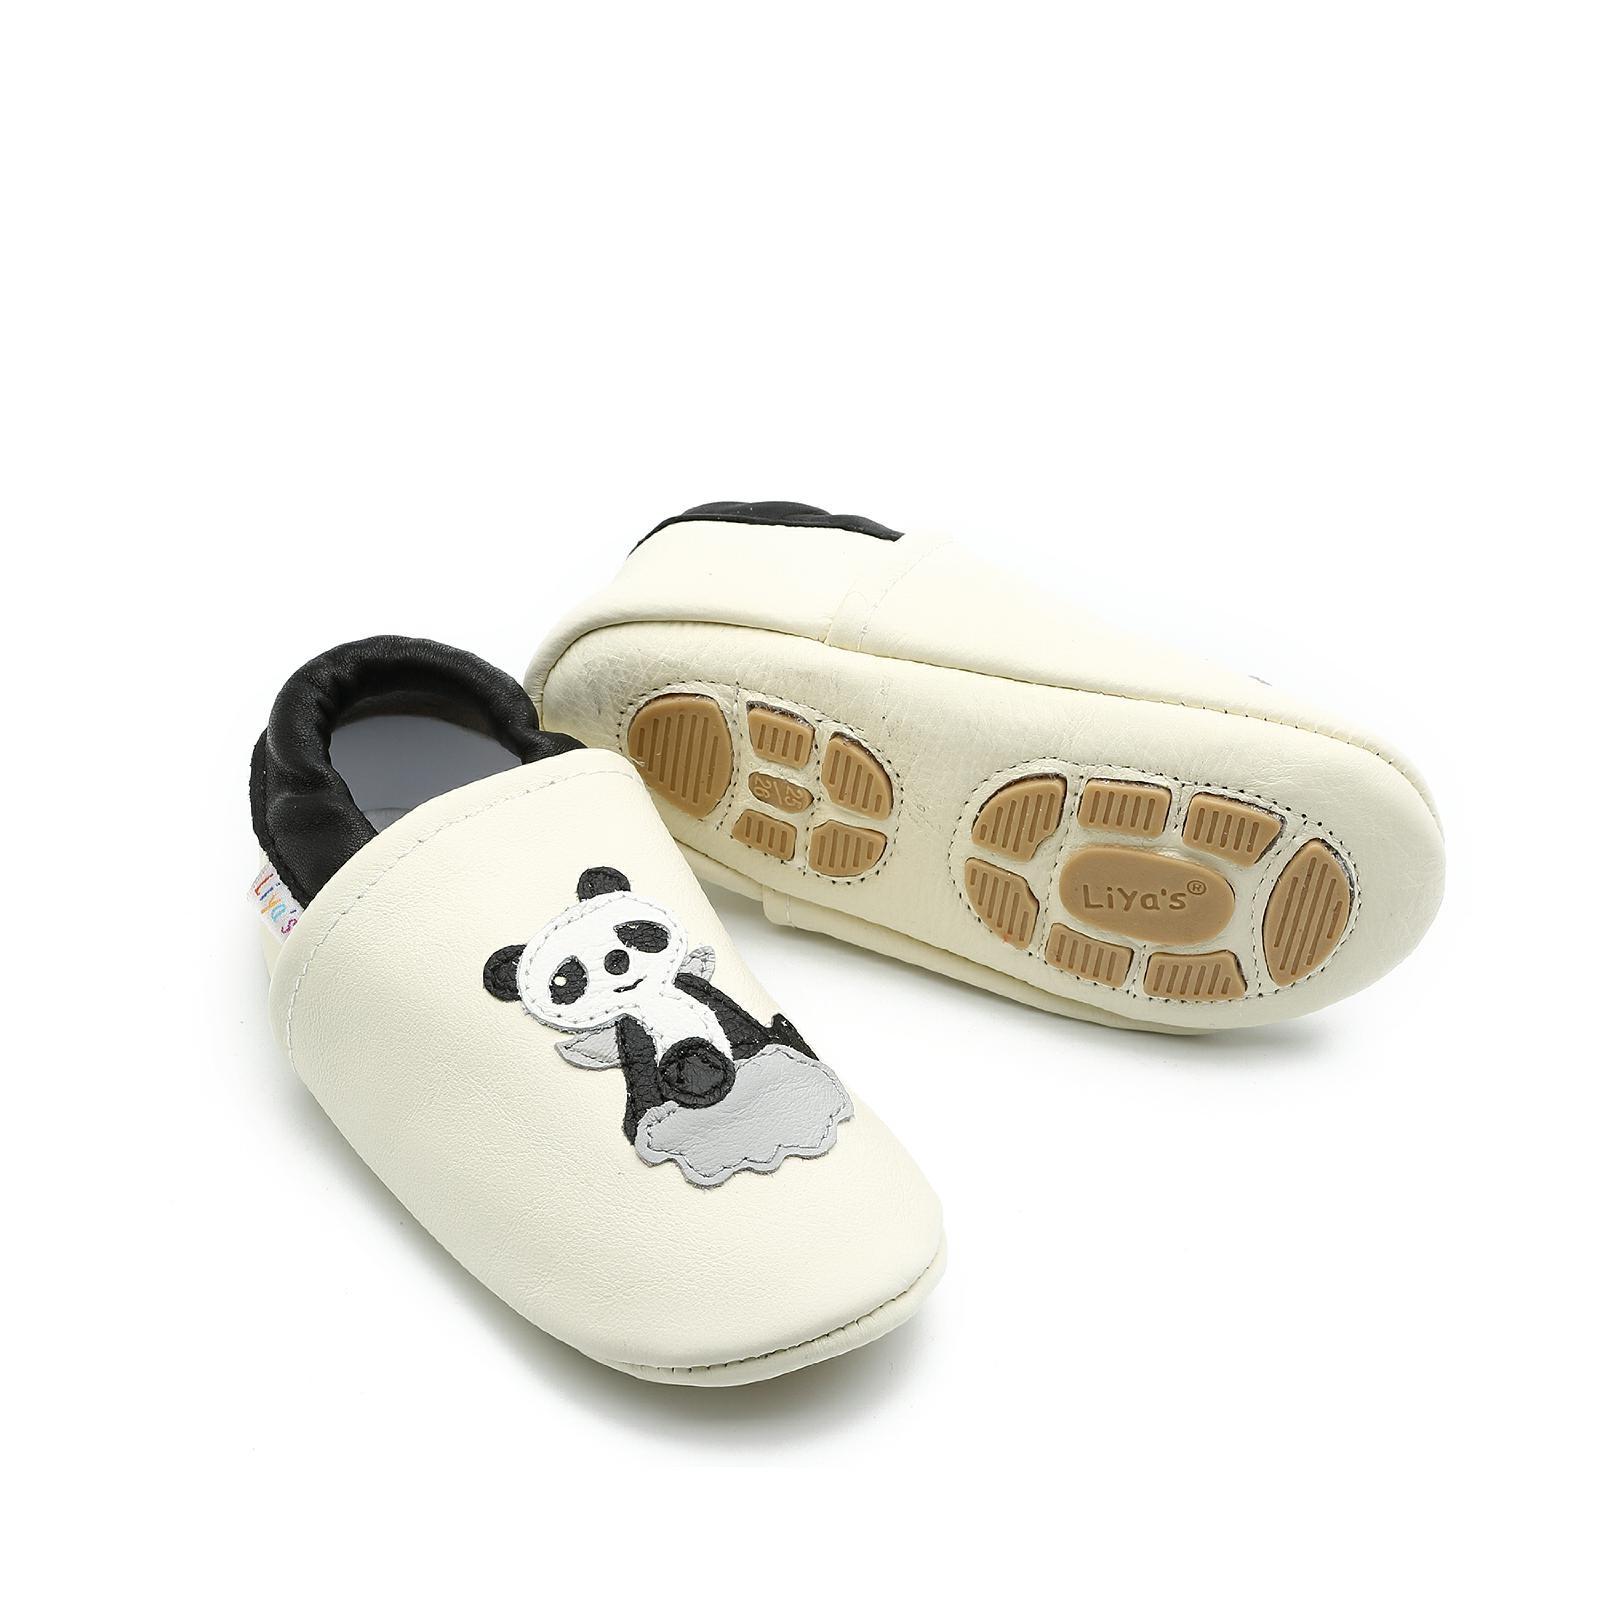 Liya's Hauschuhe mit Gummisohle - #602 Panda in weiß